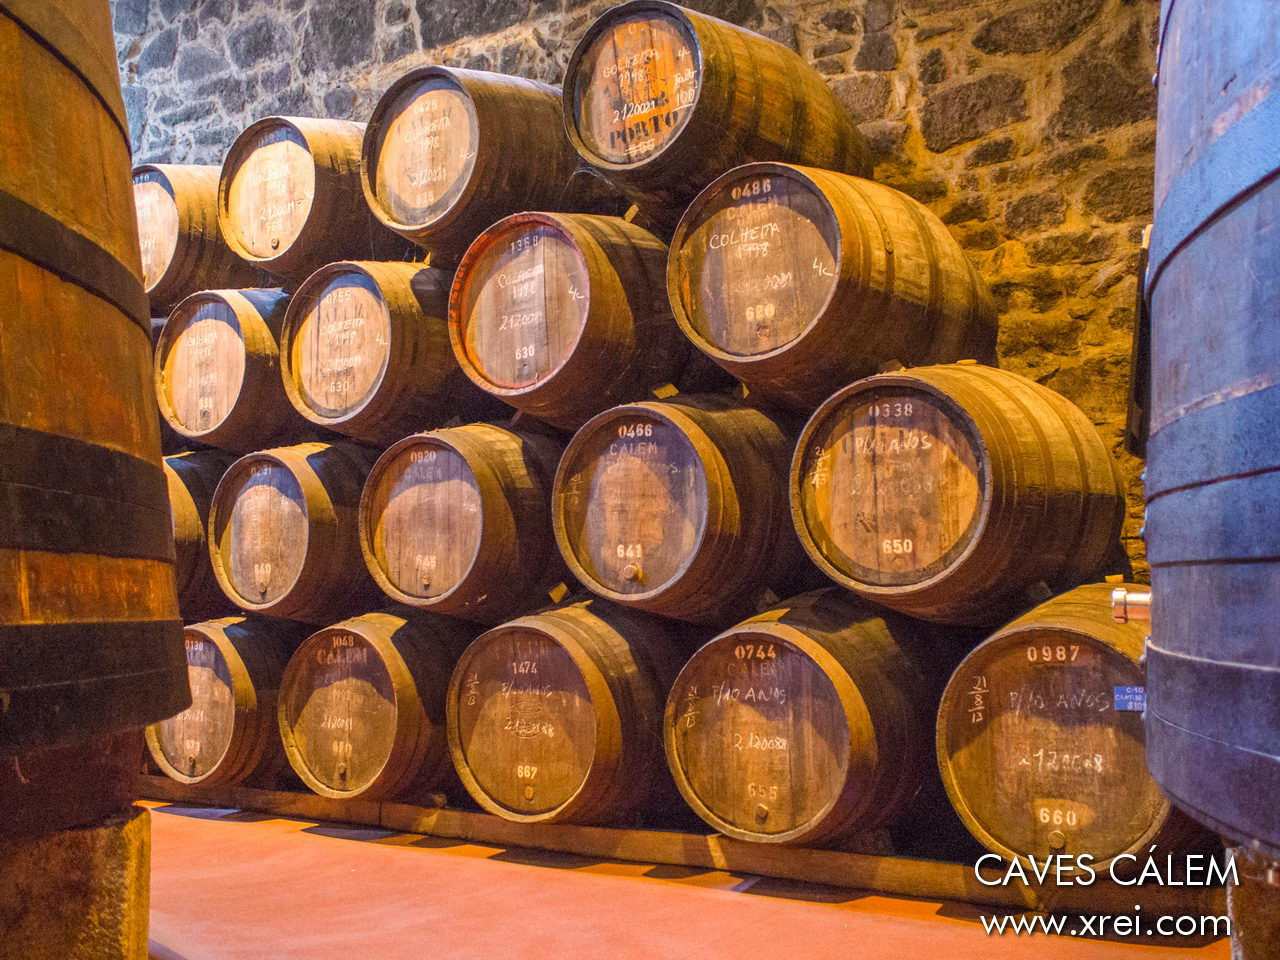 Barriles de vino almacenados con la cosecha de 1998 en las bodegas CALÉM de Vila Nova de Gaia